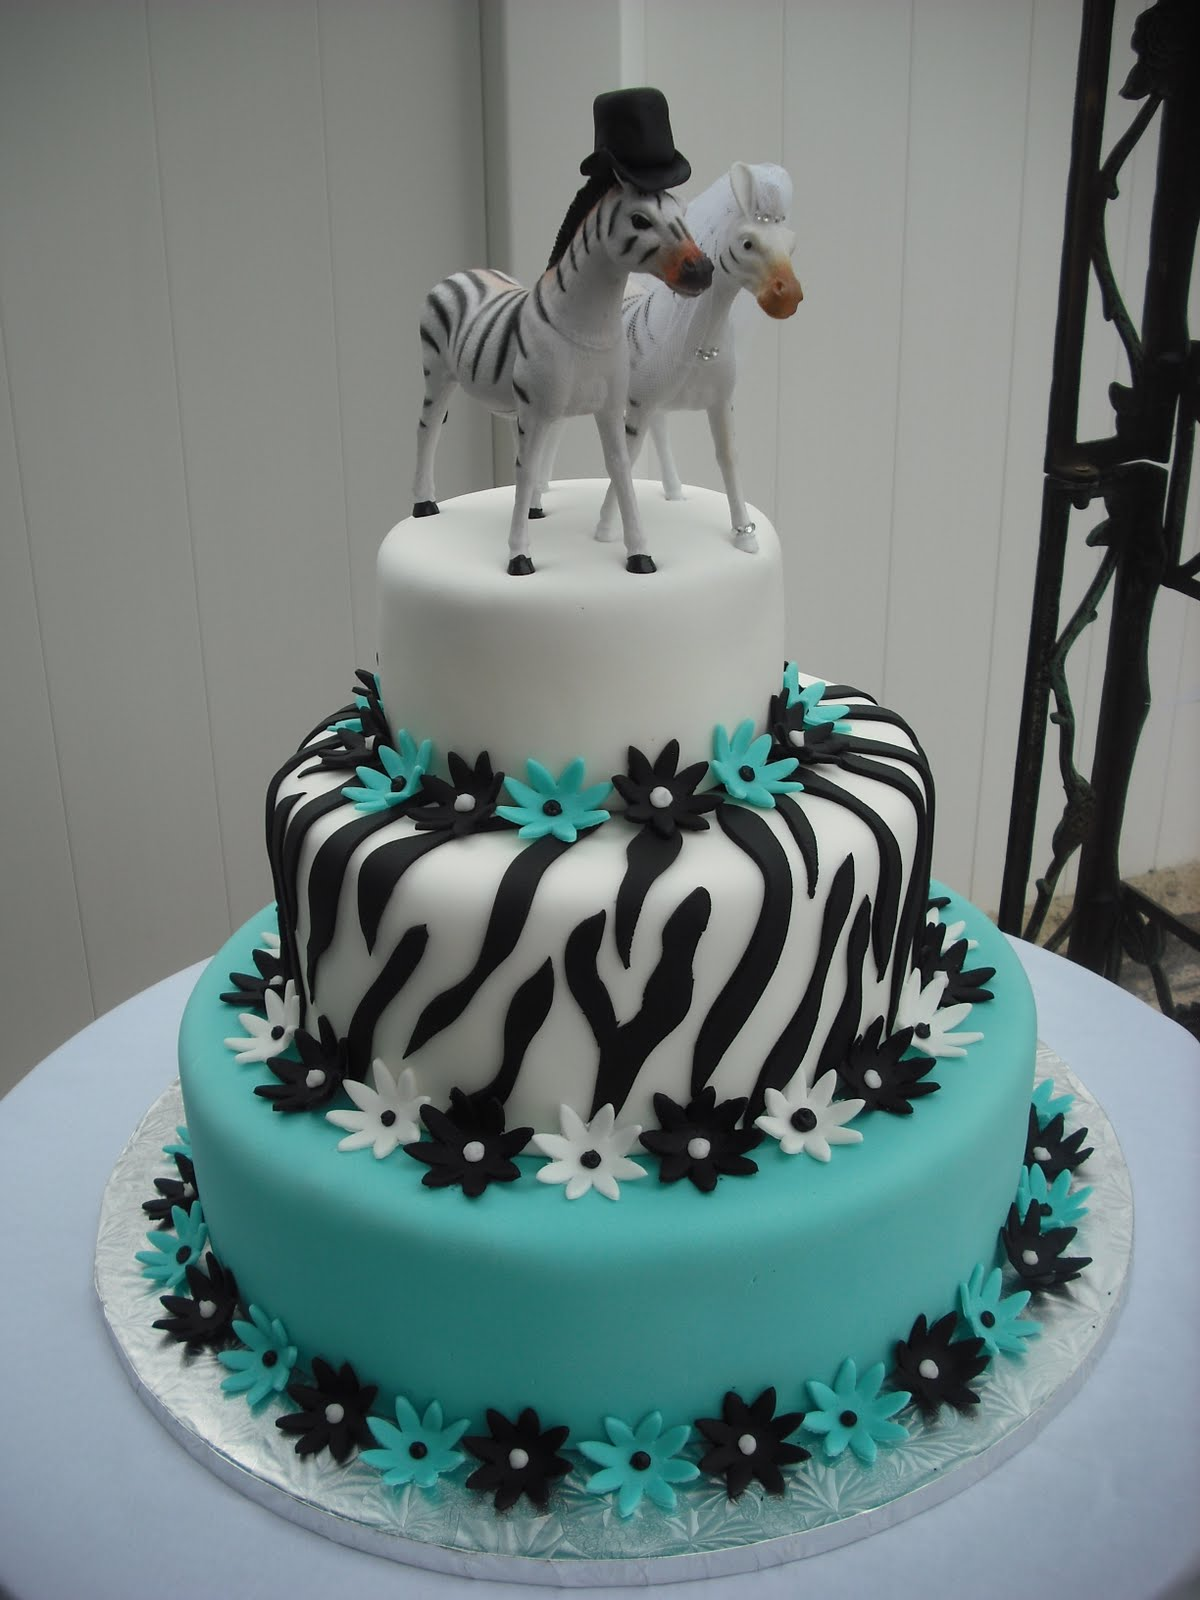 6 2014 Cheetah And Zebra Print Cakes Photo Hello Kitty Cheetah